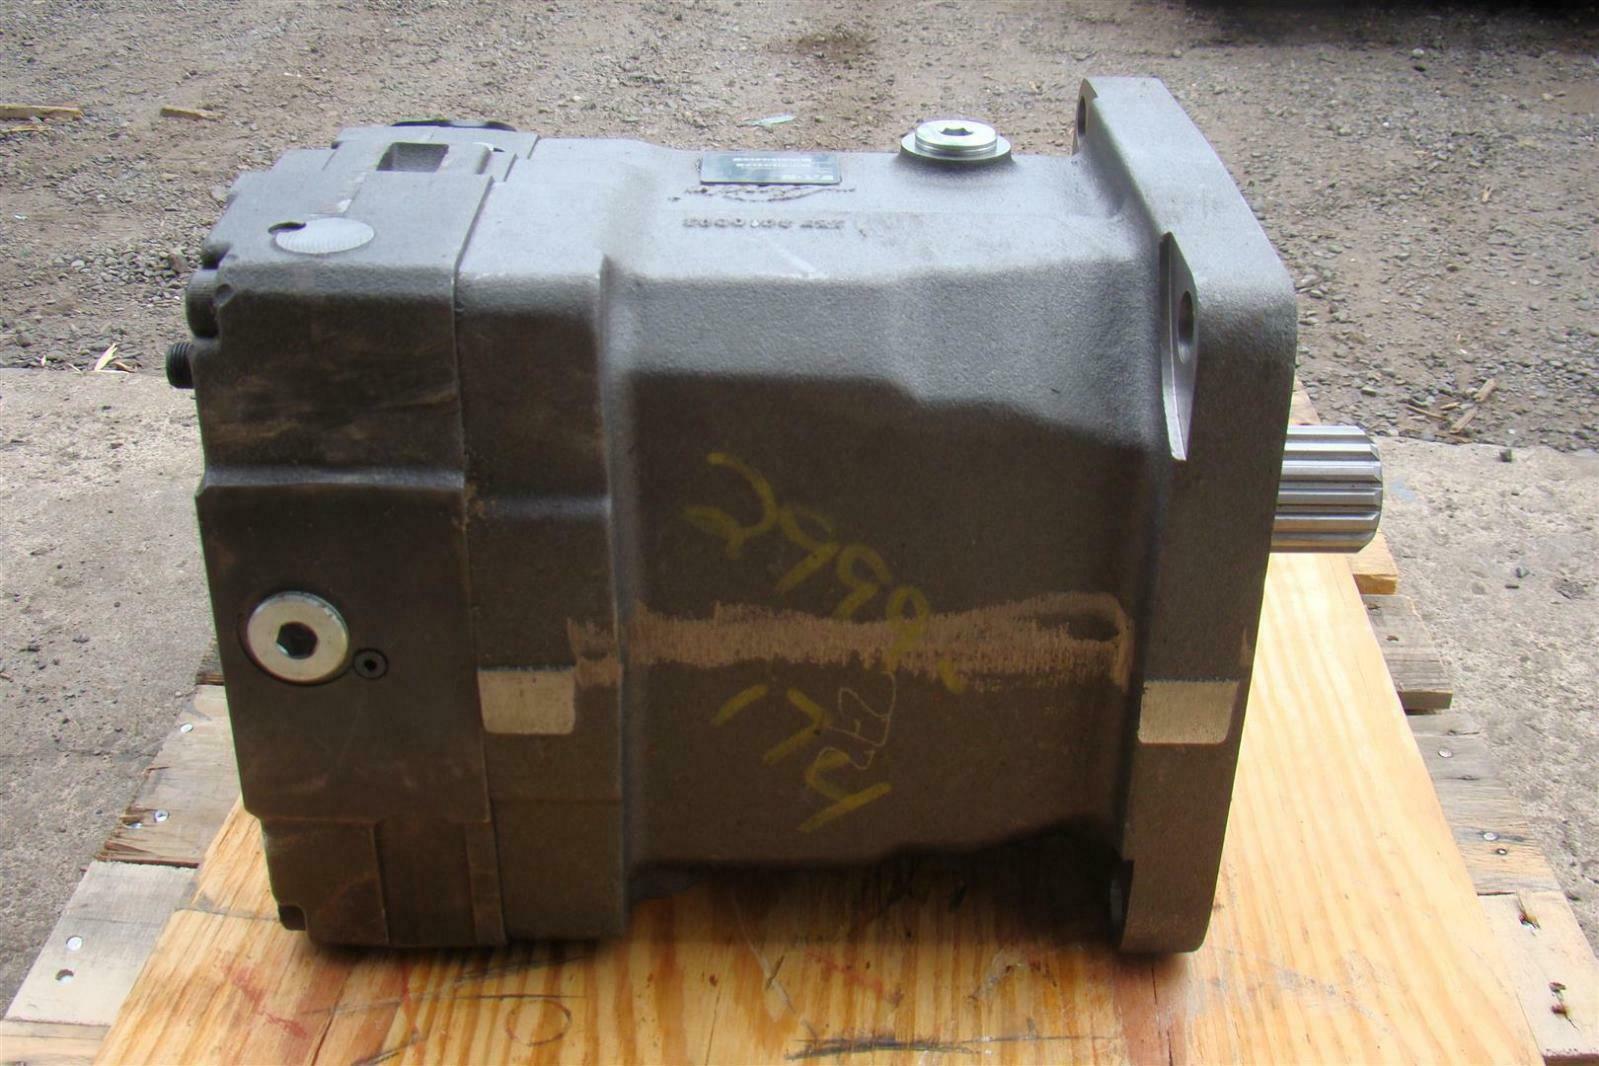 Eaton variable displacment hydraulic motor hmv 210 Eaton motor